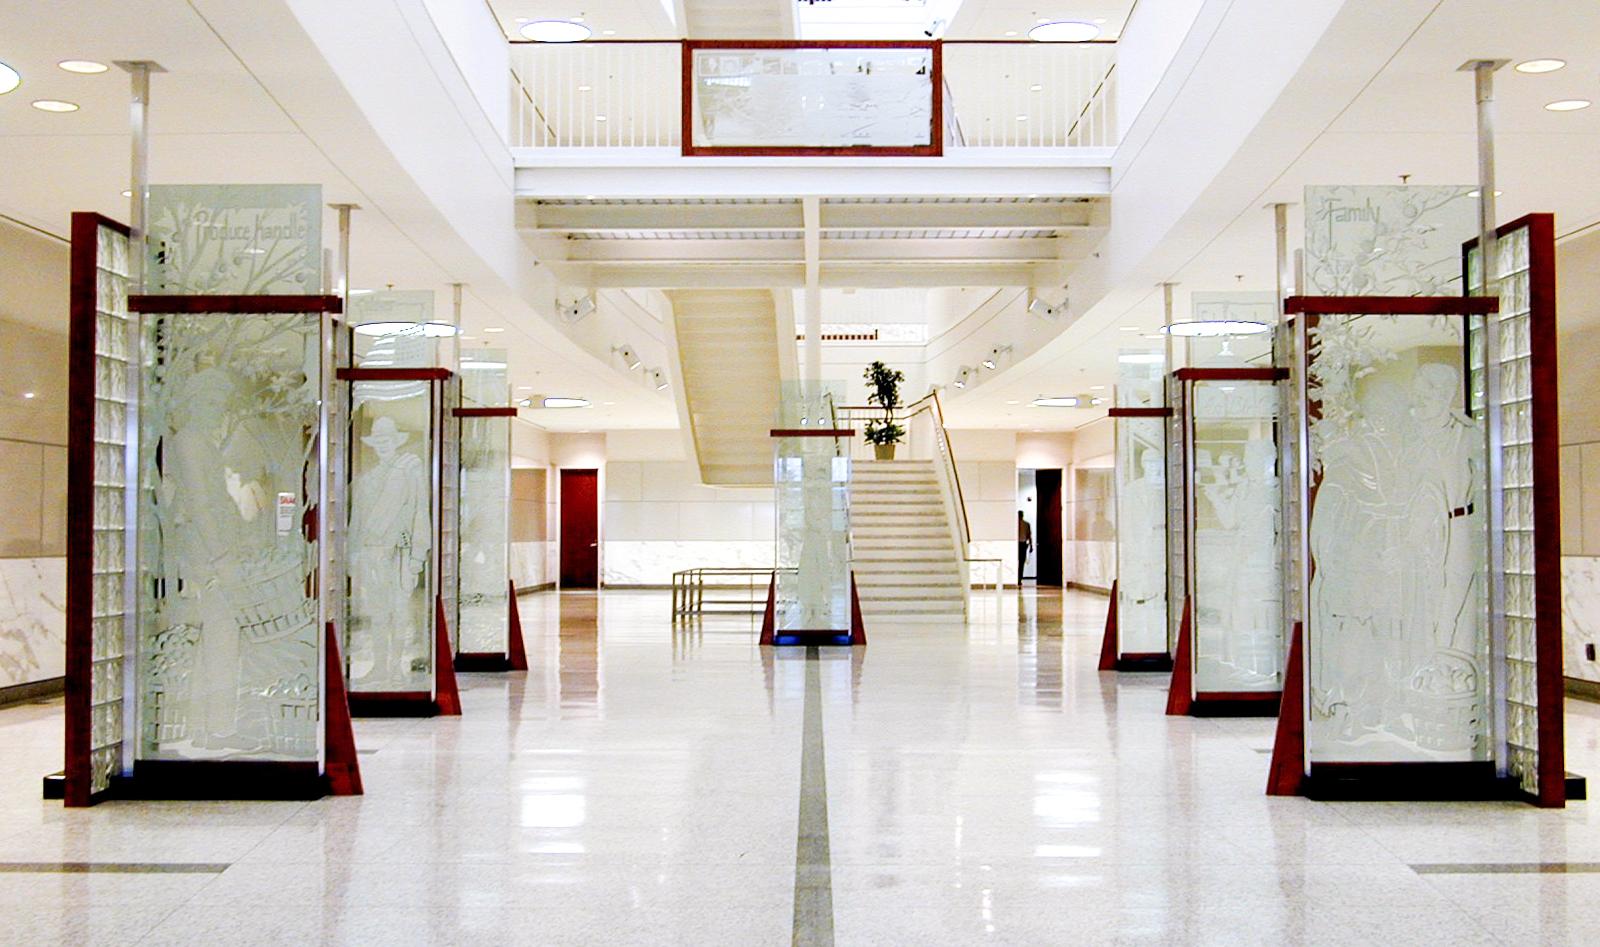 la-frontera-brownsville-courthouse-pegasus-studio-inc-etched-glass-sculptures-1.jpg